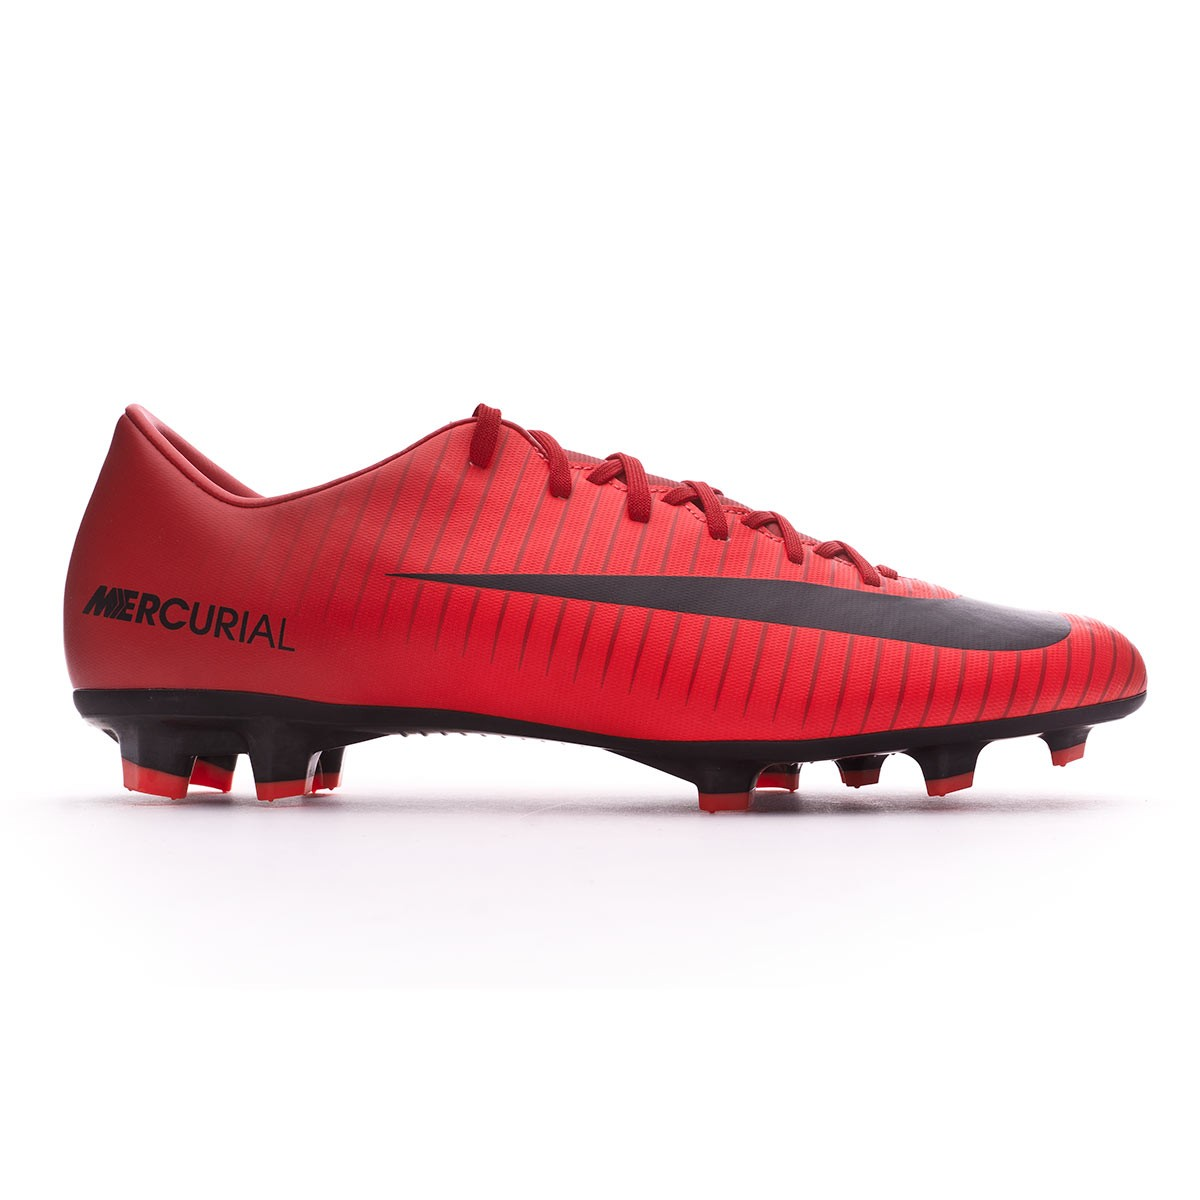 ... Bota Mercurial Victory VI FG University red-Black-Bright crimson.  Categorías de la Bota de fútbol. Botas de fútbol 0e5039c496885